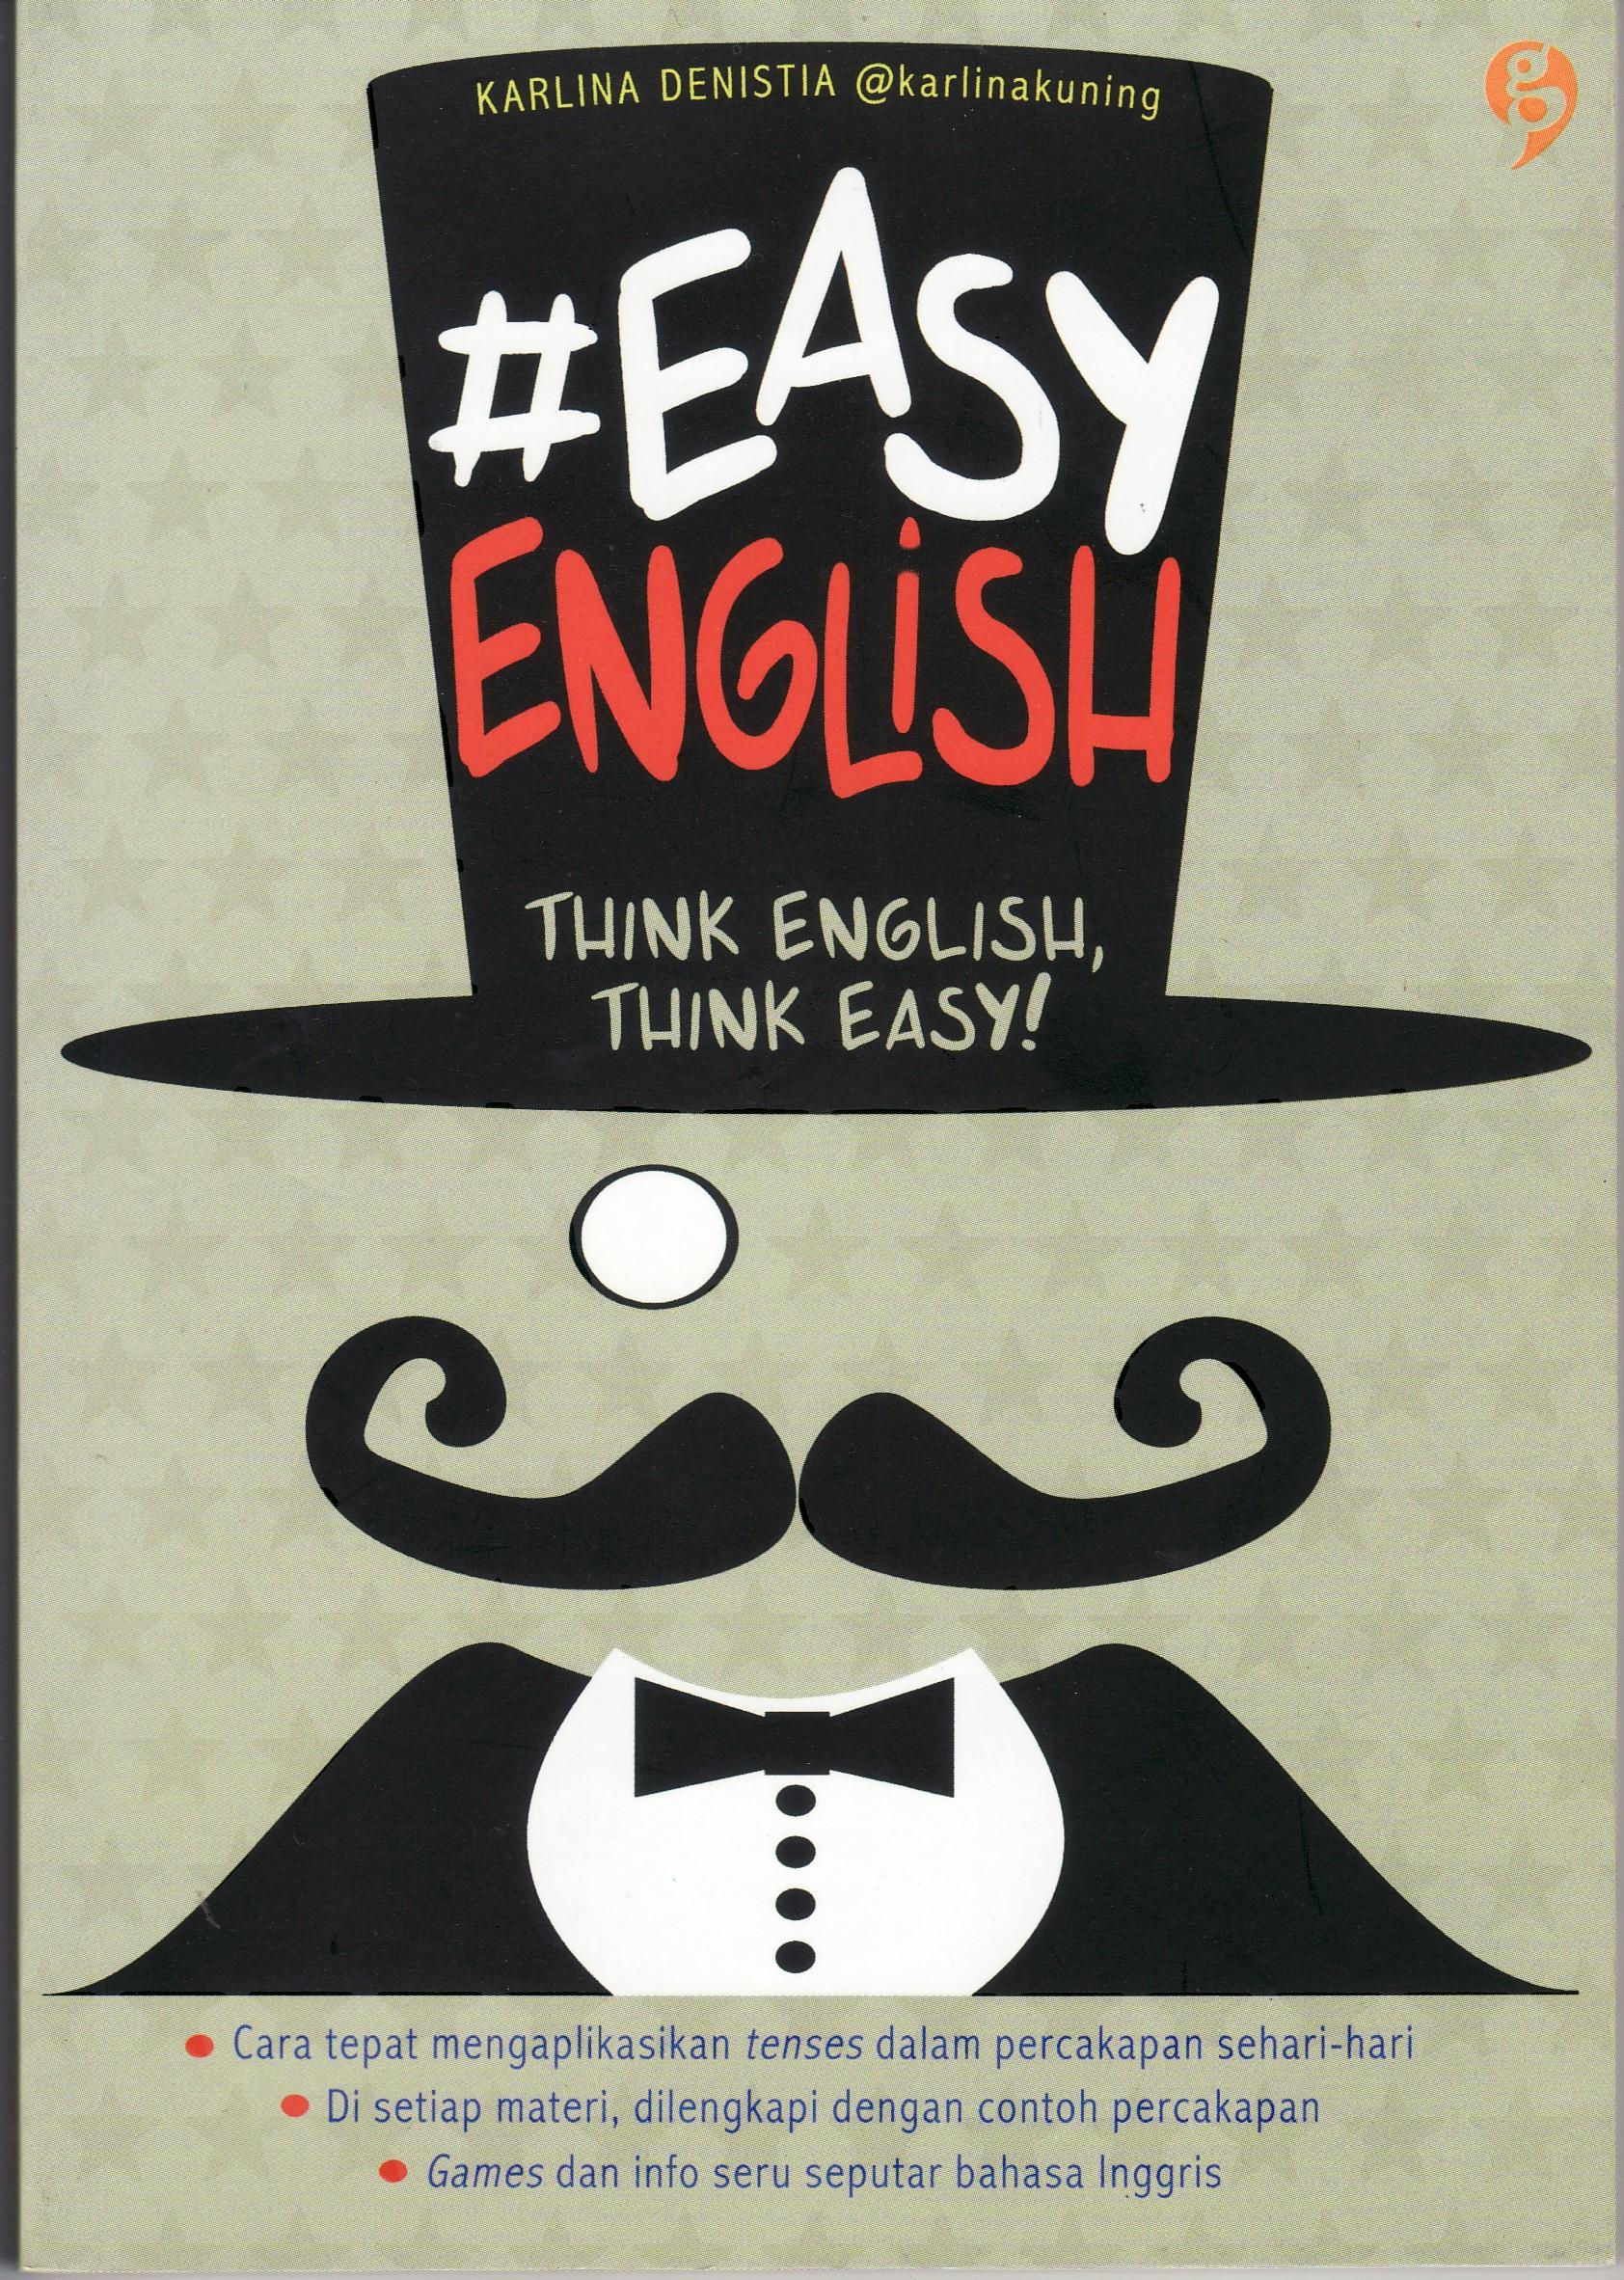 Jurusan Sastra Inggris Dan Peluang Kerjanya Lowongan Kerja Terbaru